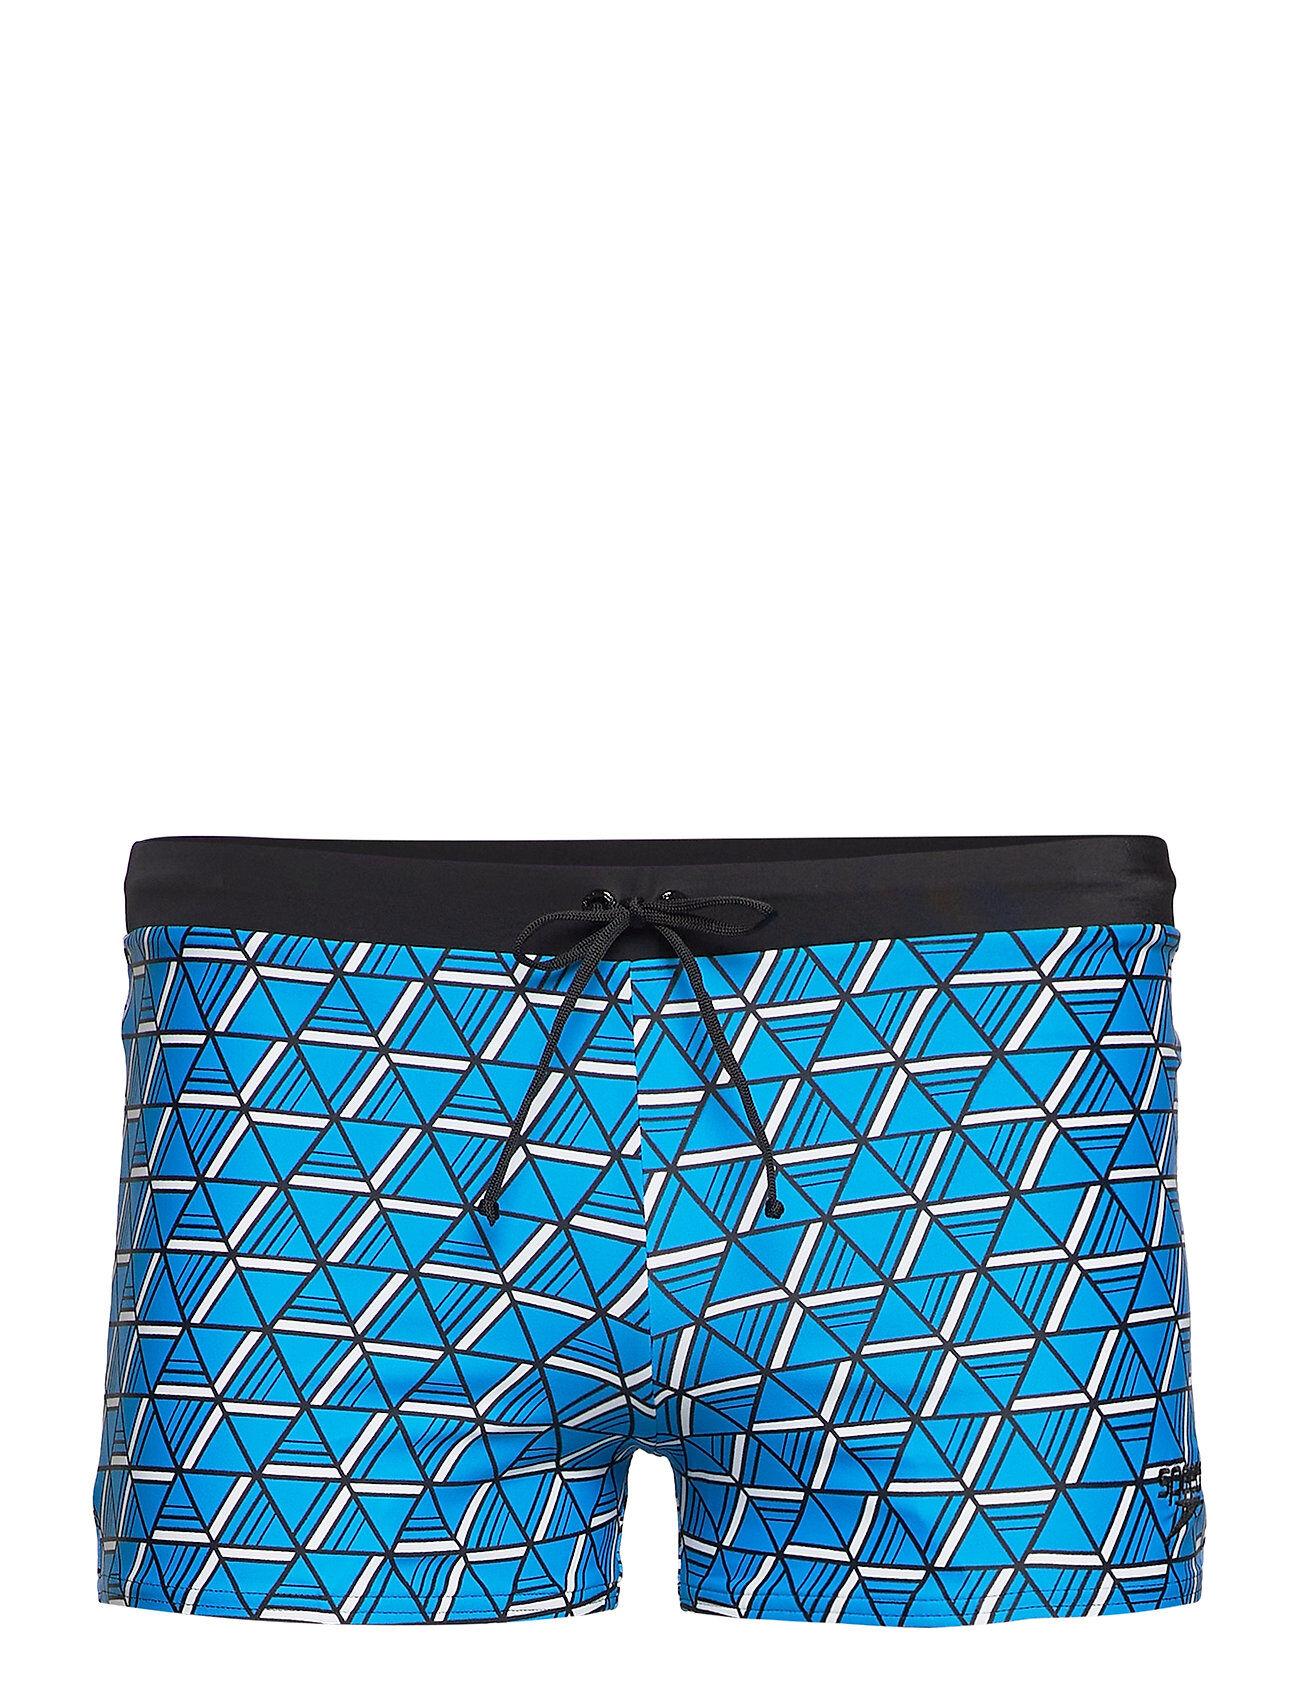 Speedo Valmilton Asht Am Swimwear Briefs & Speedos Blå Speedo